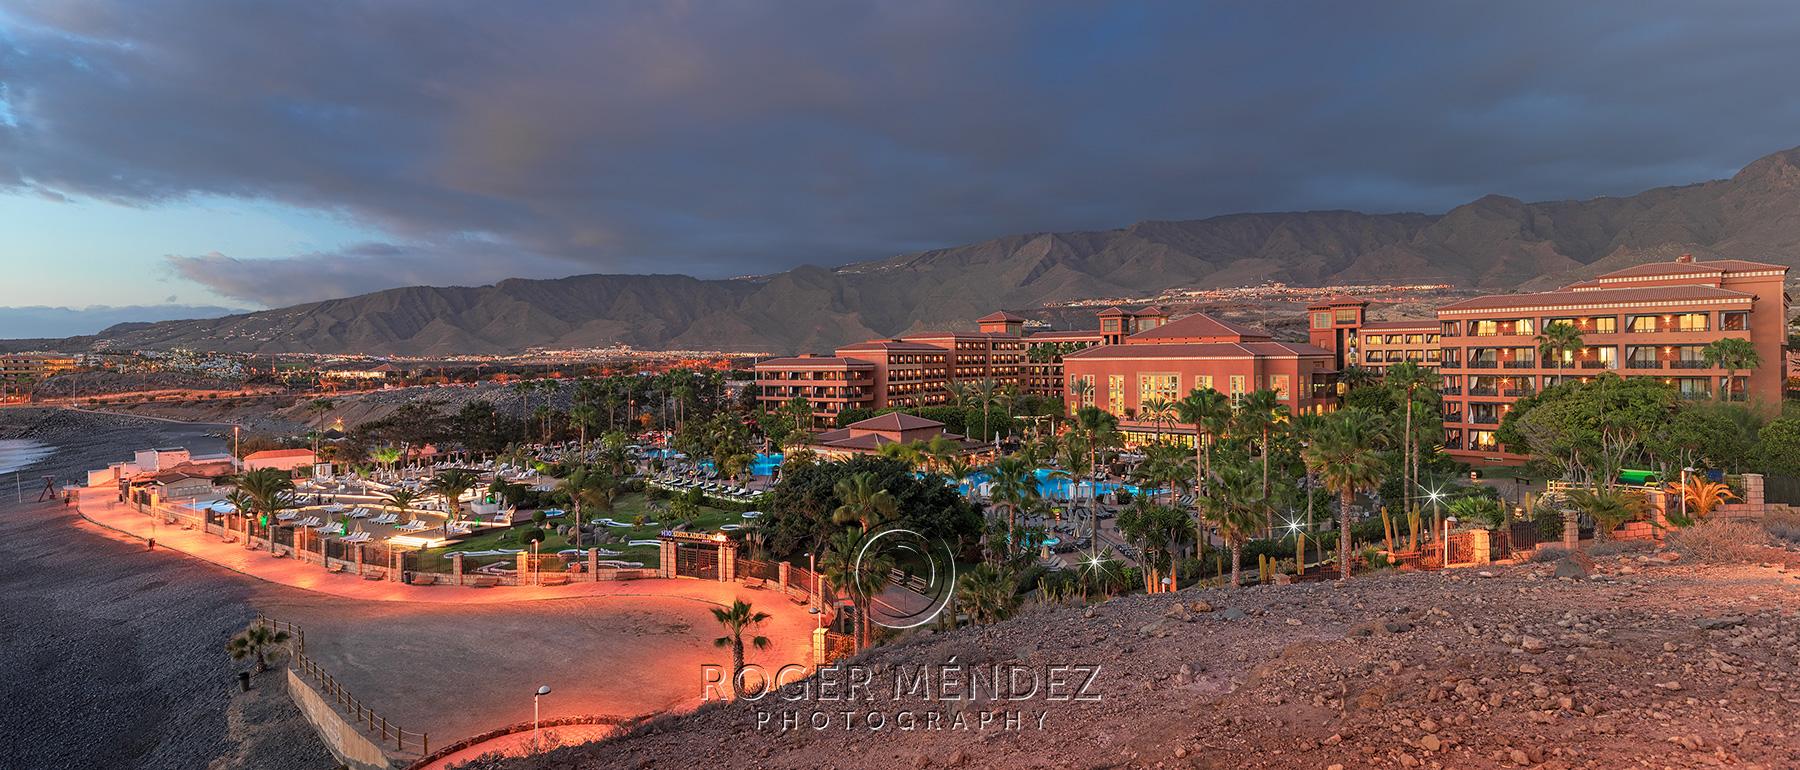 Panoramic hotel view at sunset